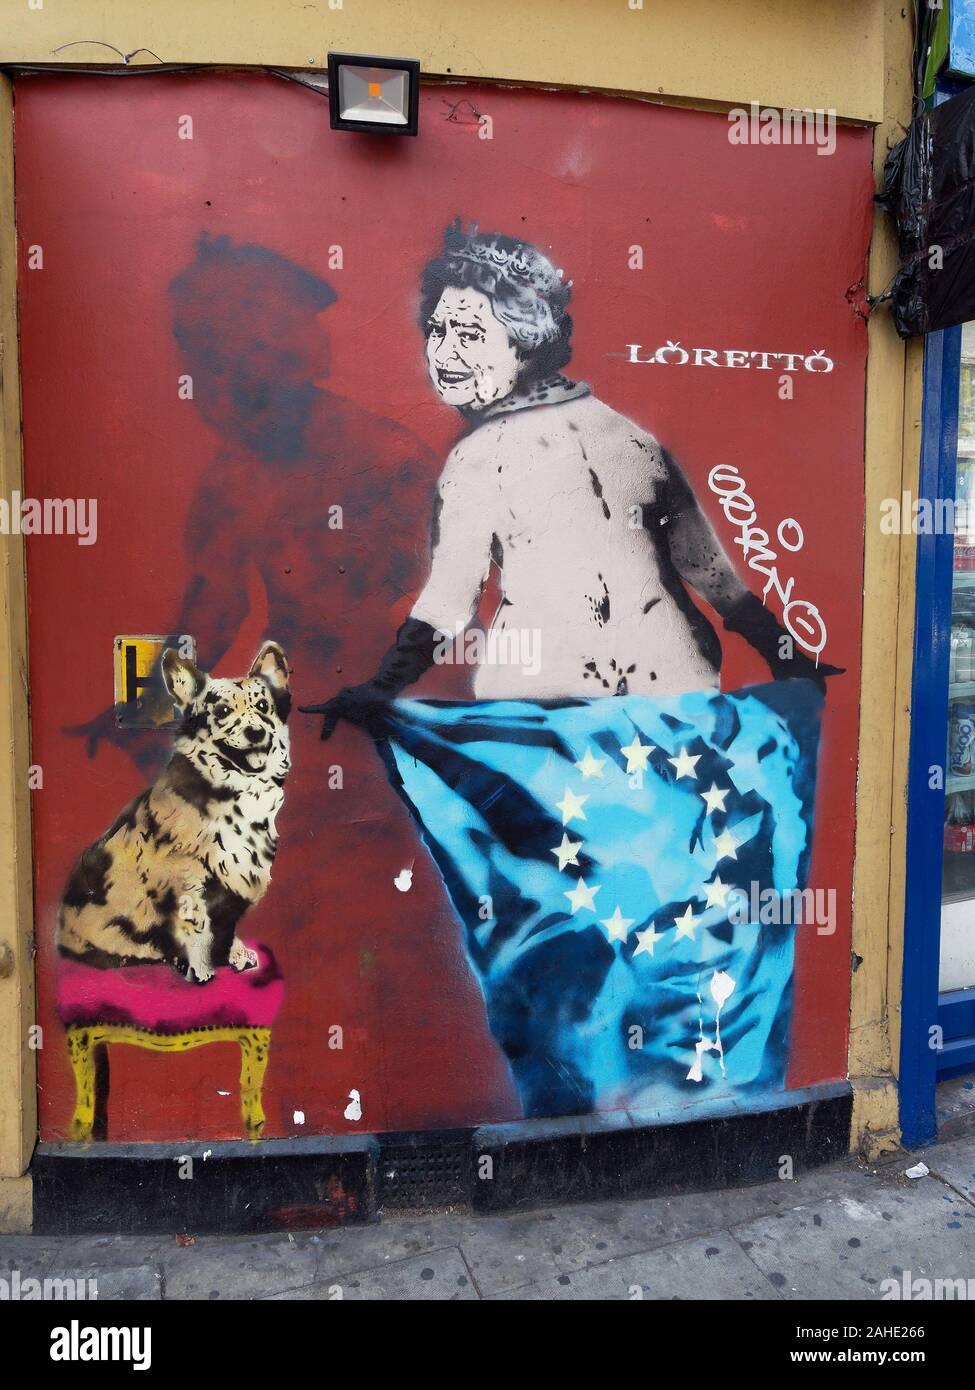 Satirical street art graffiti with Queen Elizabeth II, corgie and EU flag. Stock Photo